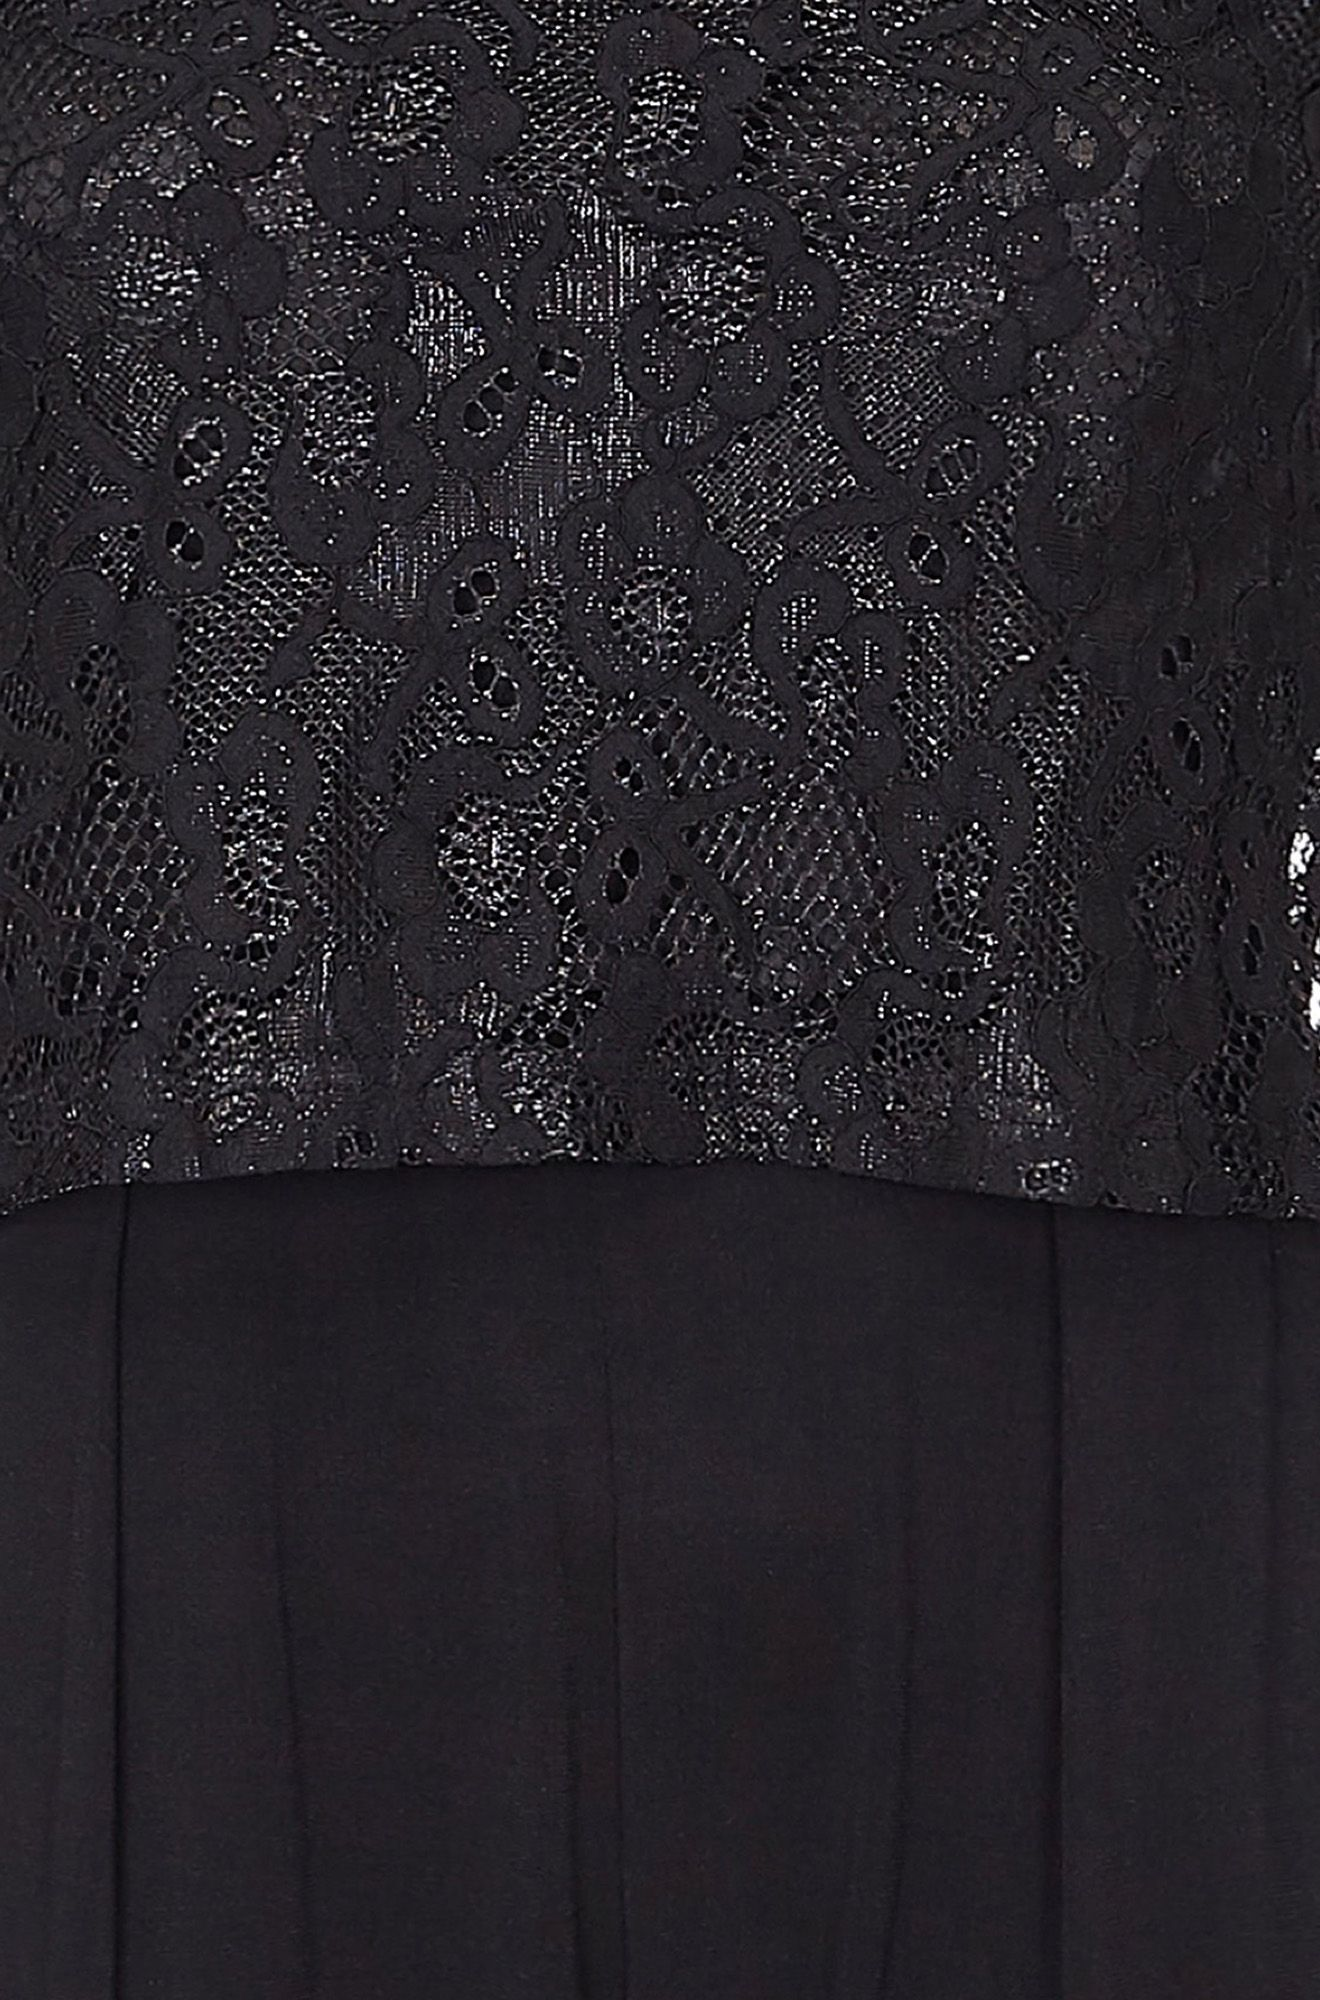 Black Lace Top Overlay Jumpsuit